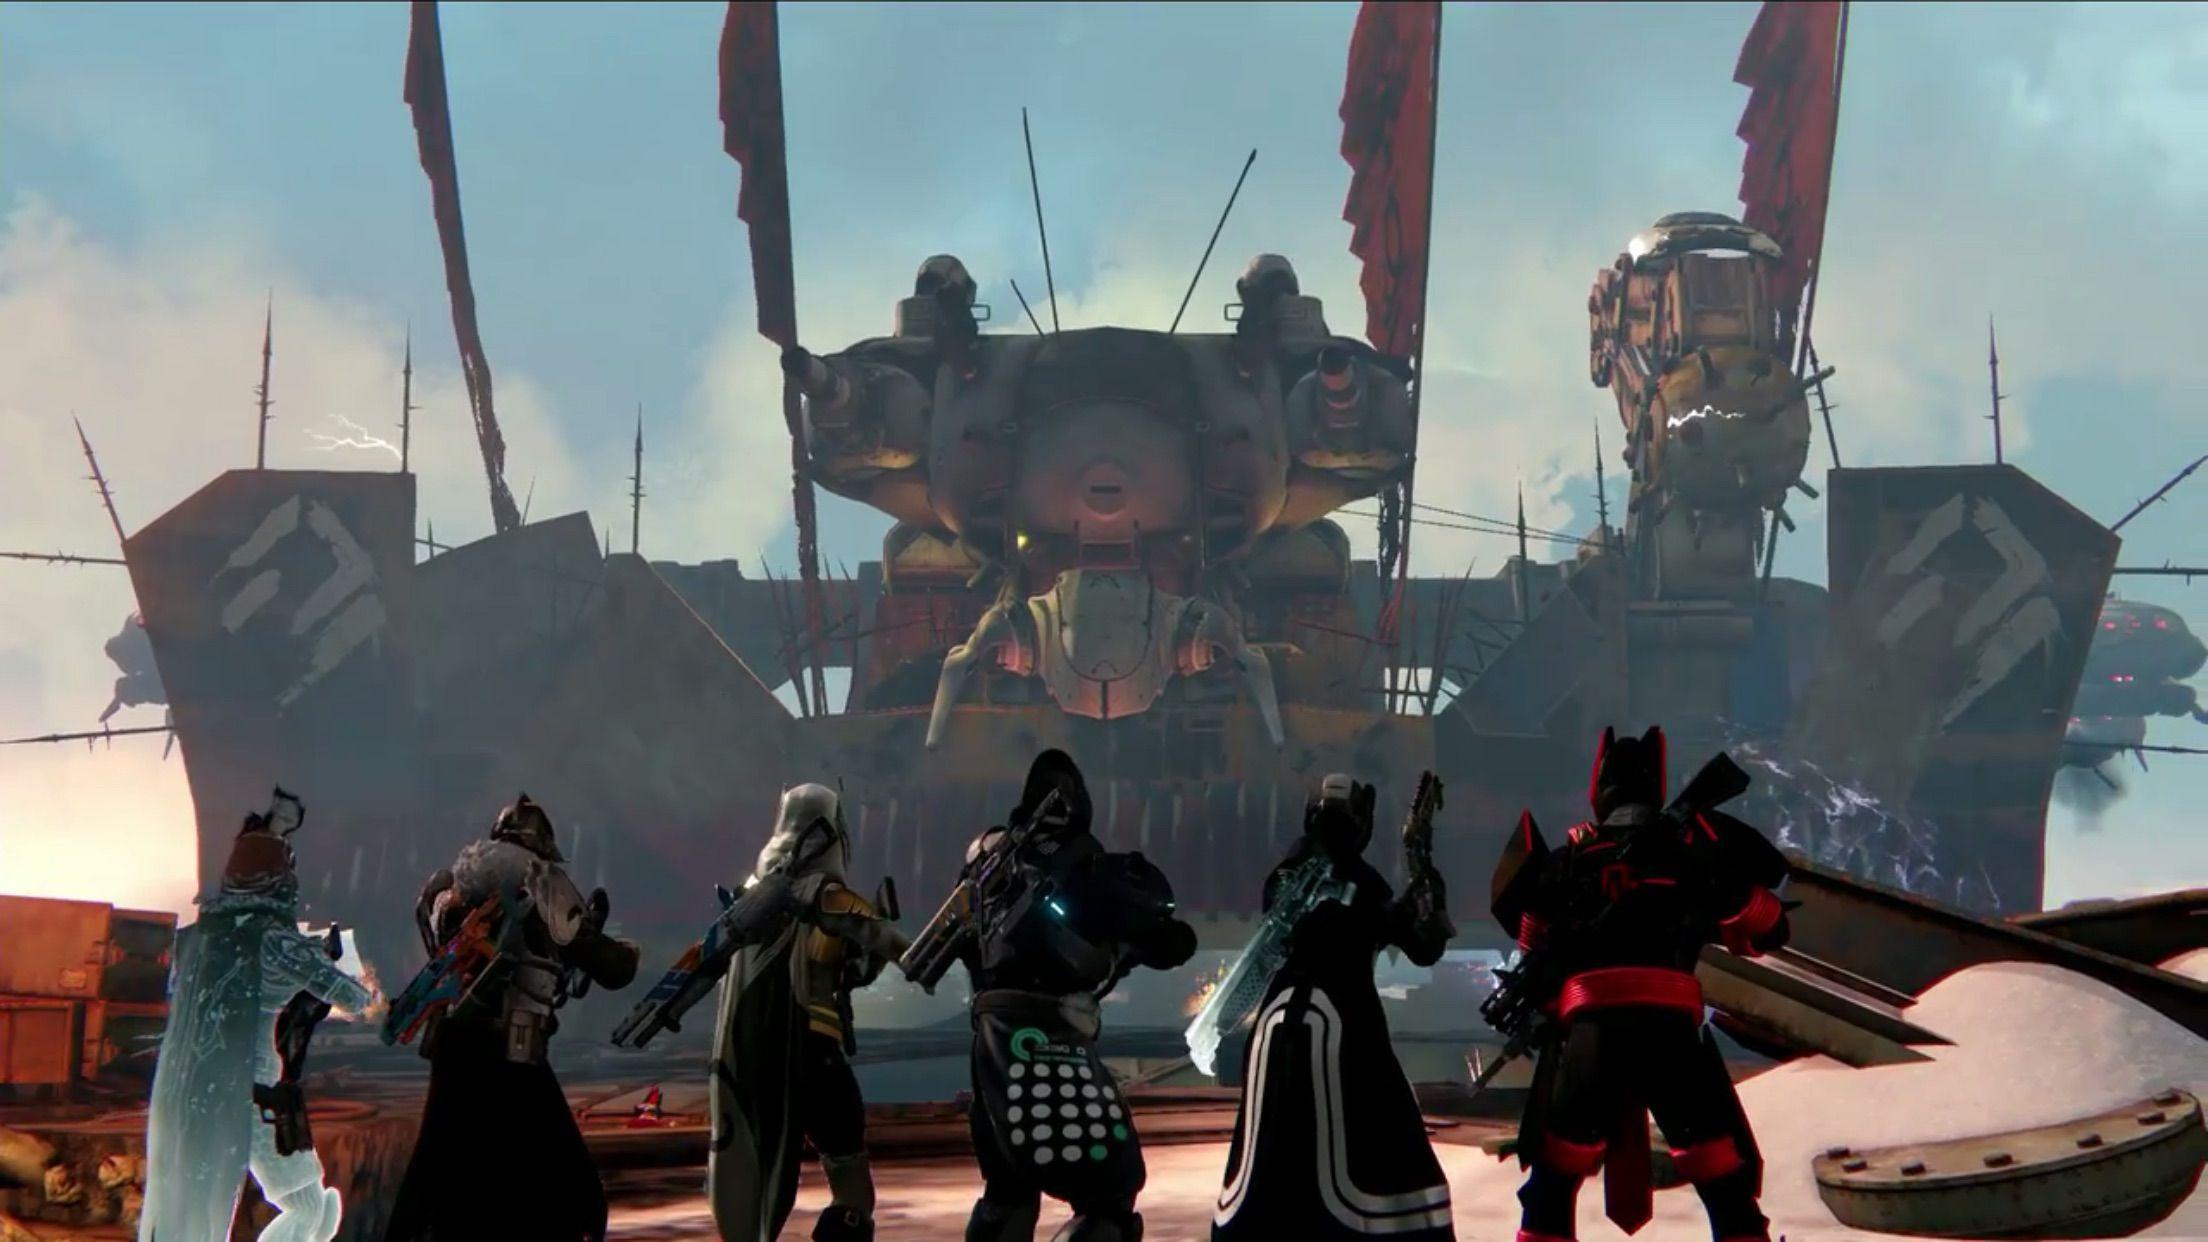 Guardians, assemble! - Изображение 1